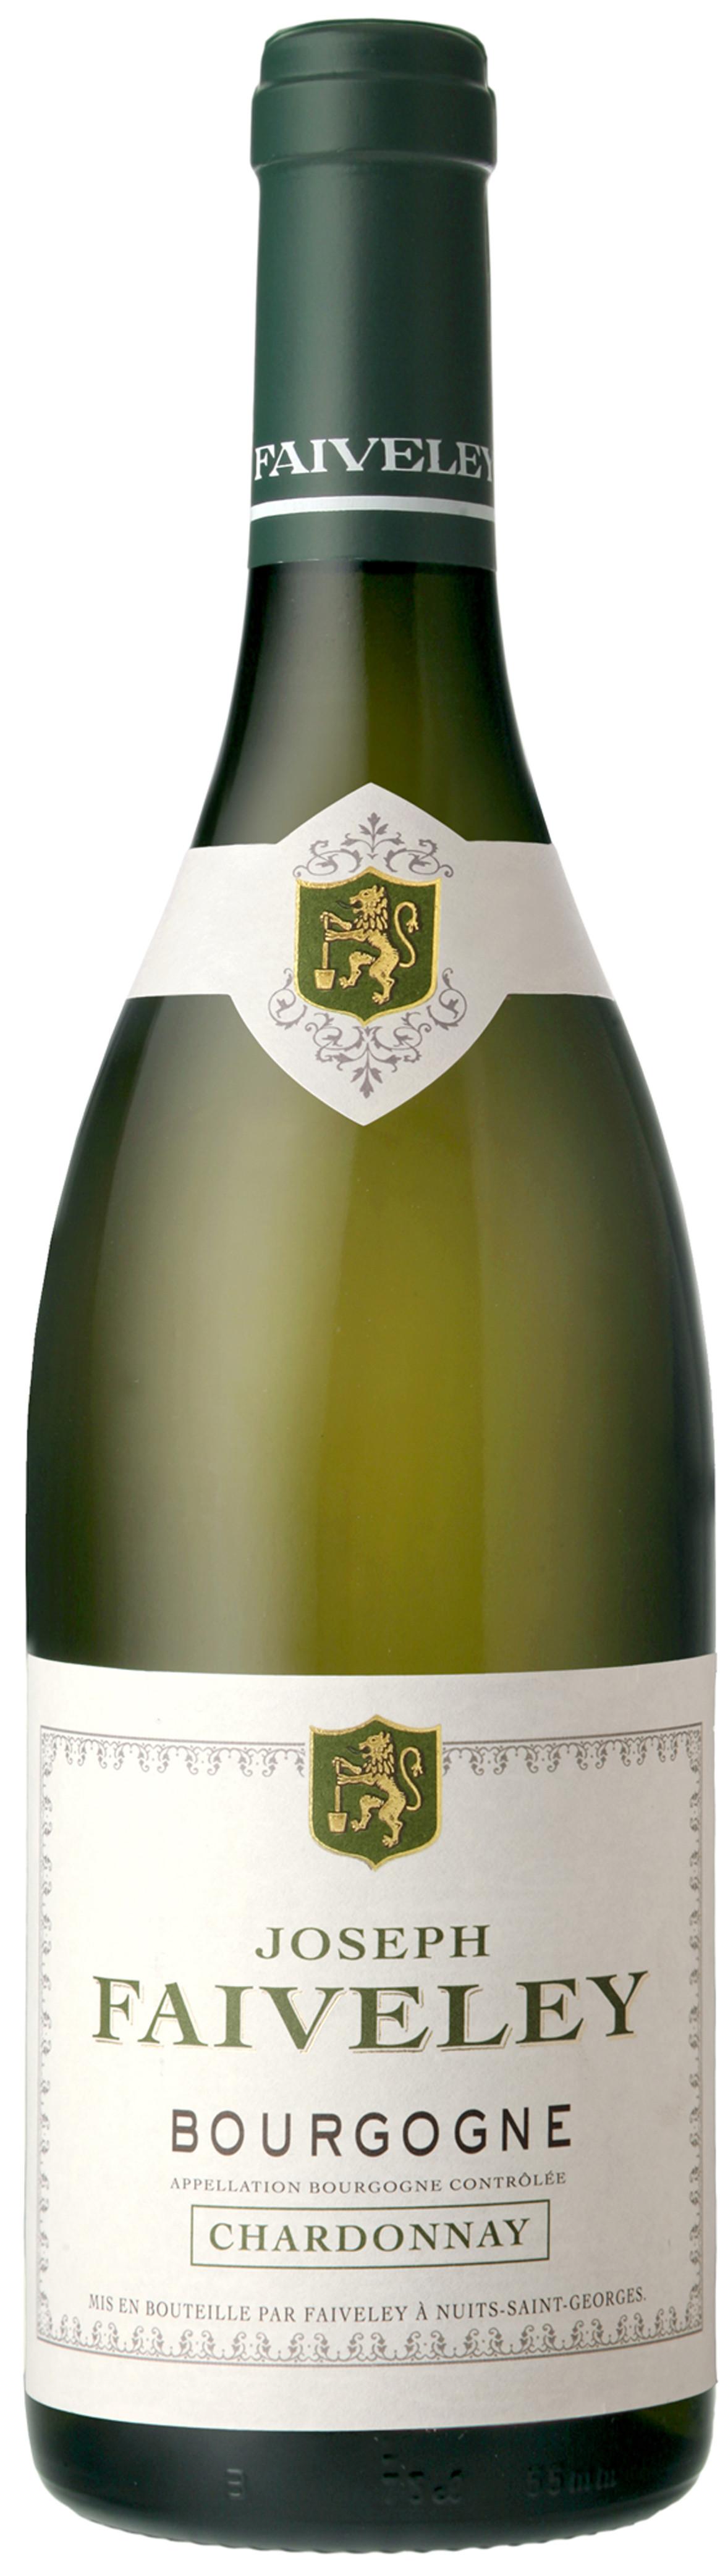 Bourgogne blanc Joseph Faiveley 2015